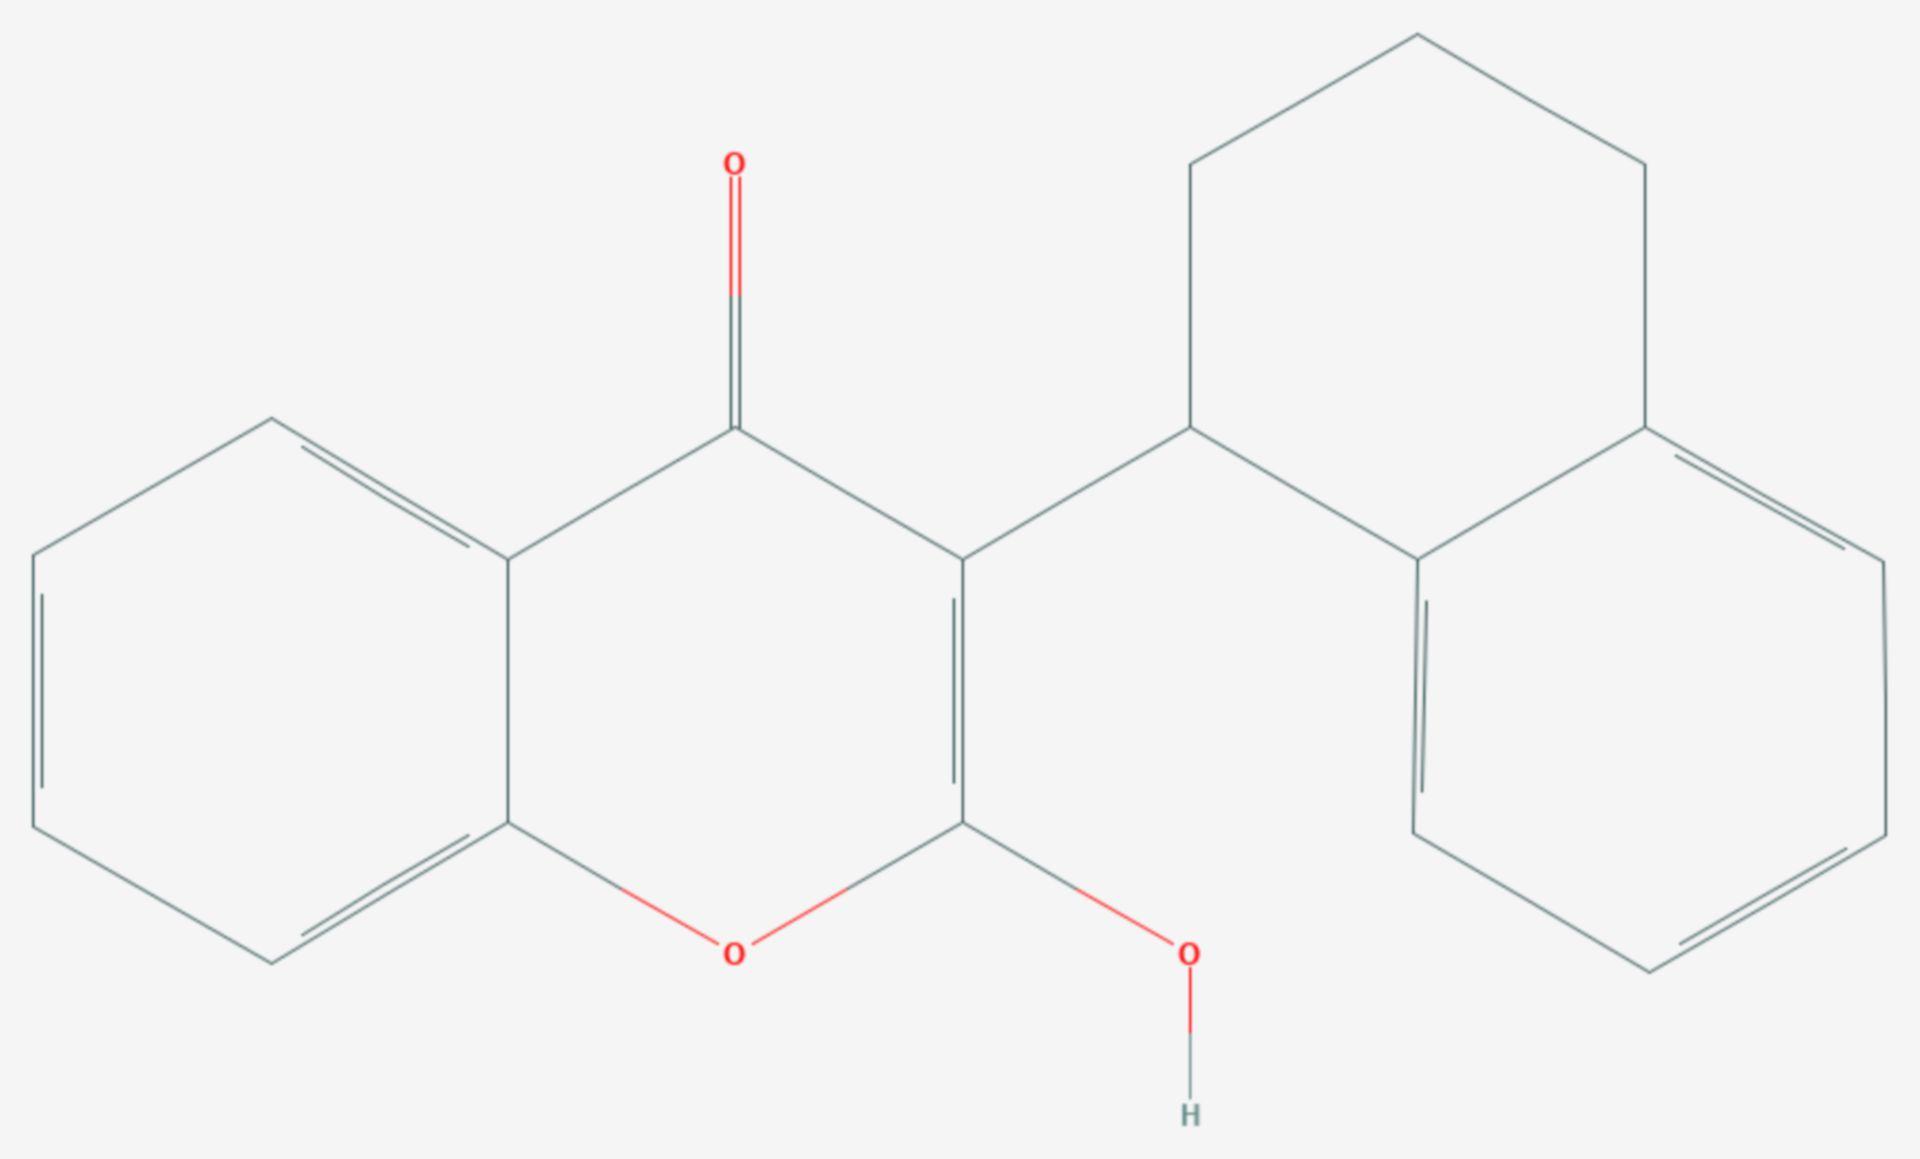 Coumatetralyl (Strukturformel)